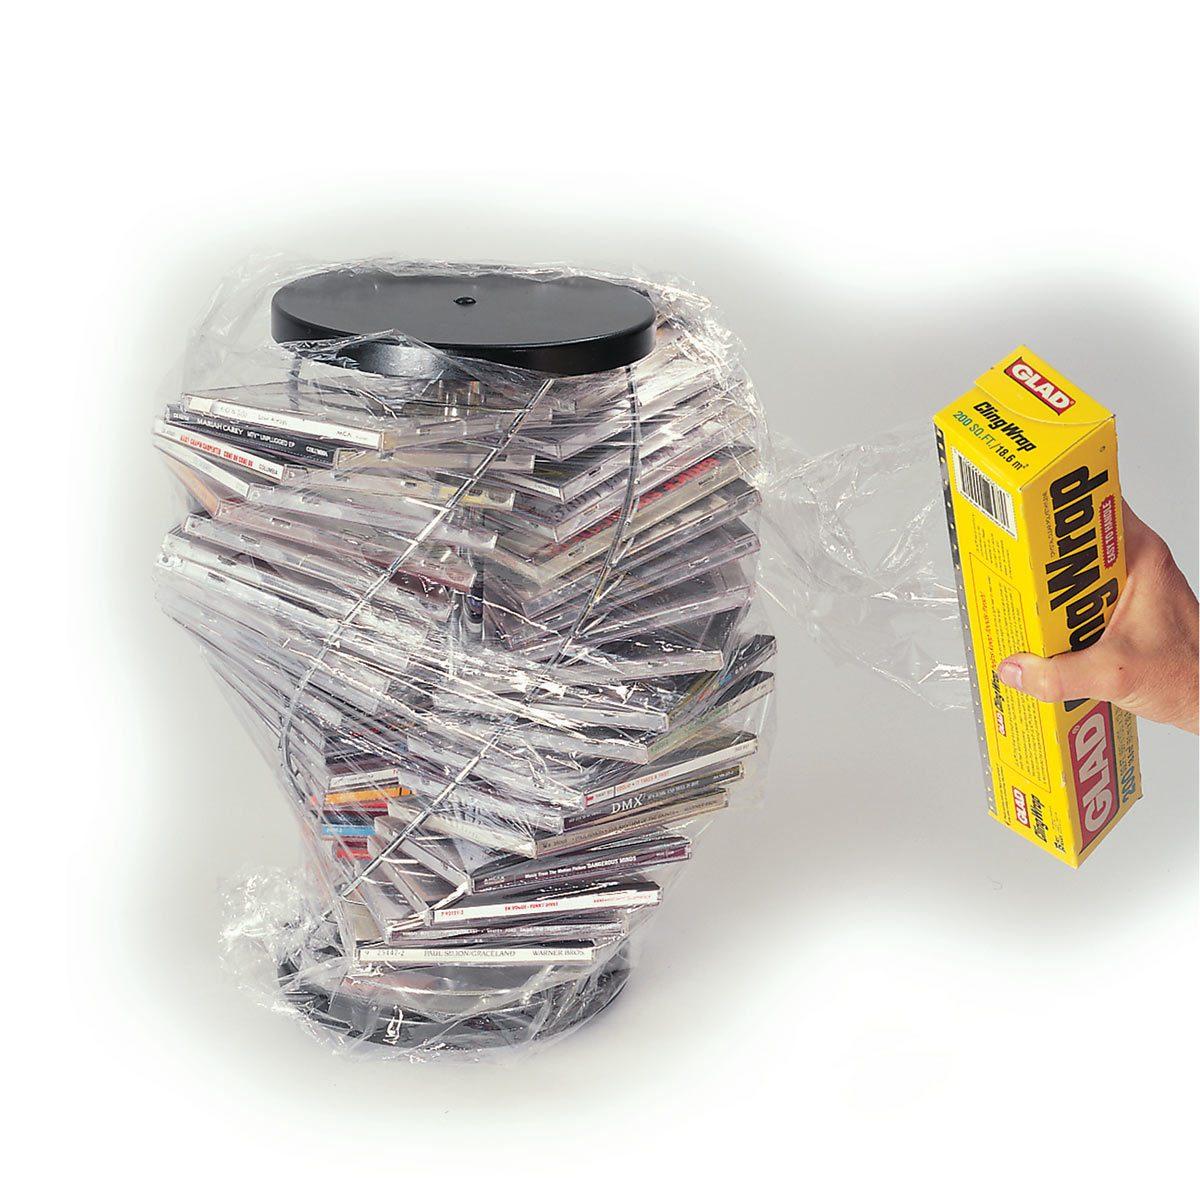 CD Racks Are Great